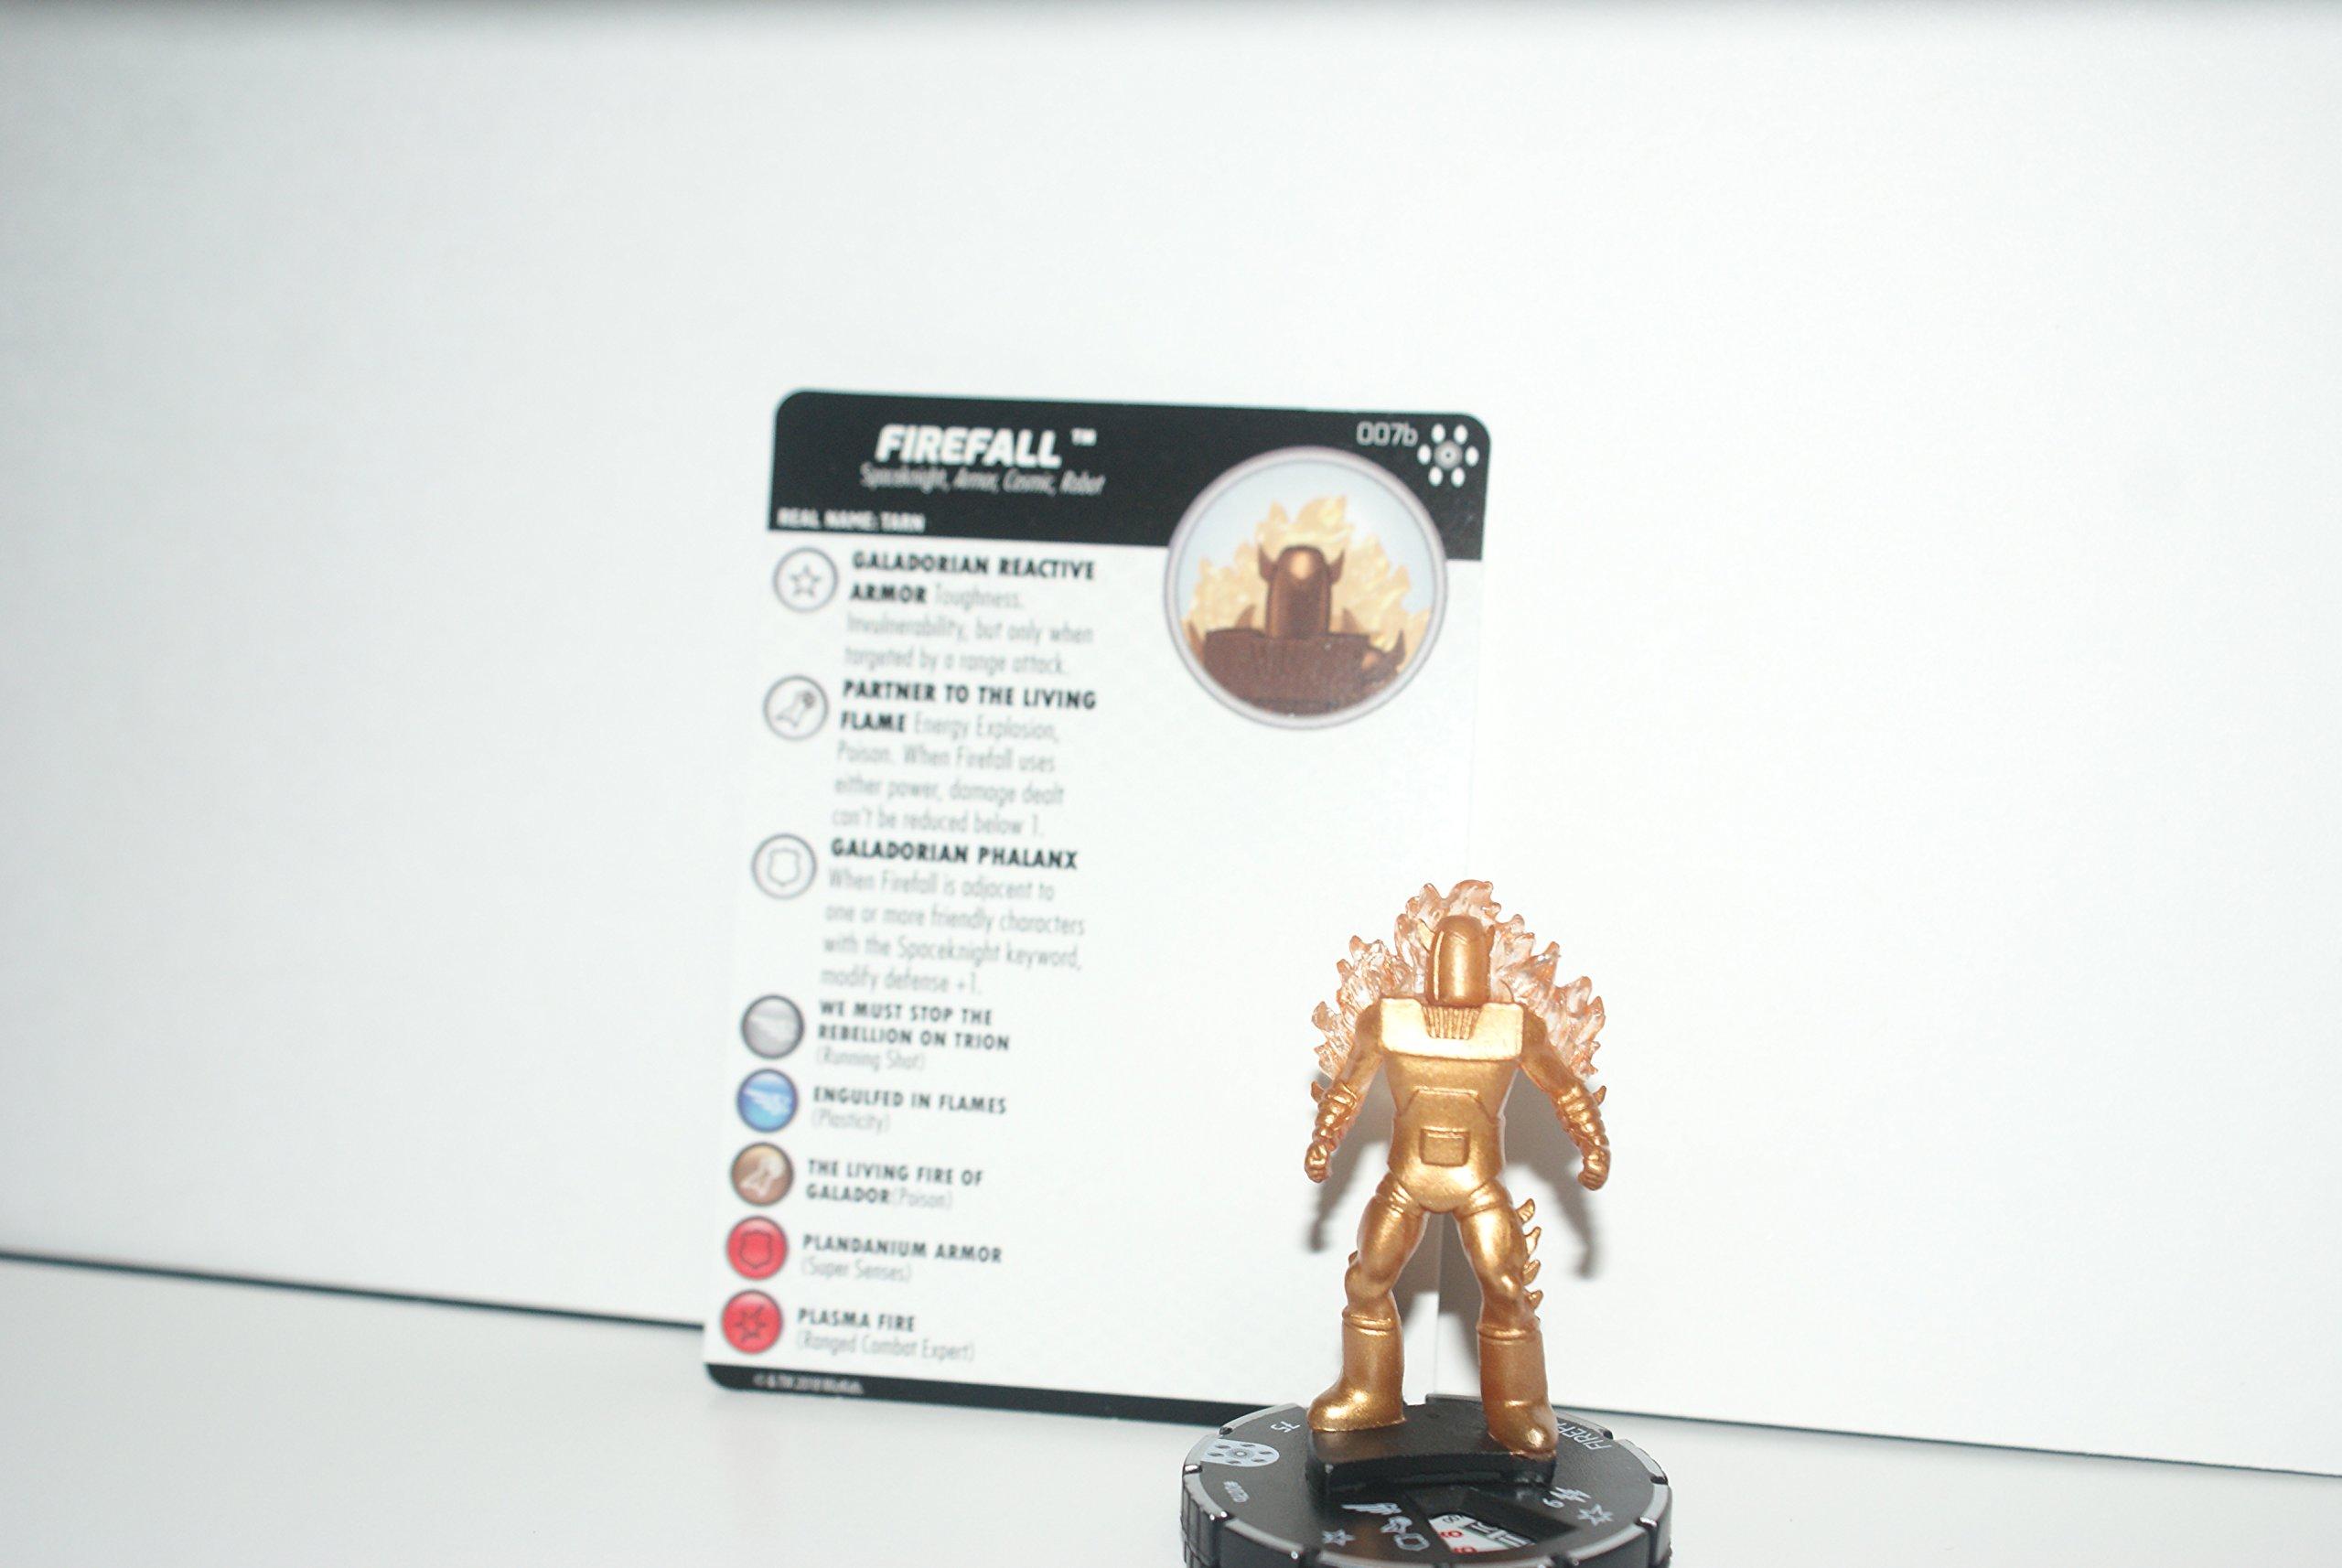 Heroclix Avengers Infinity Firefall #007b Common Prime w/Card